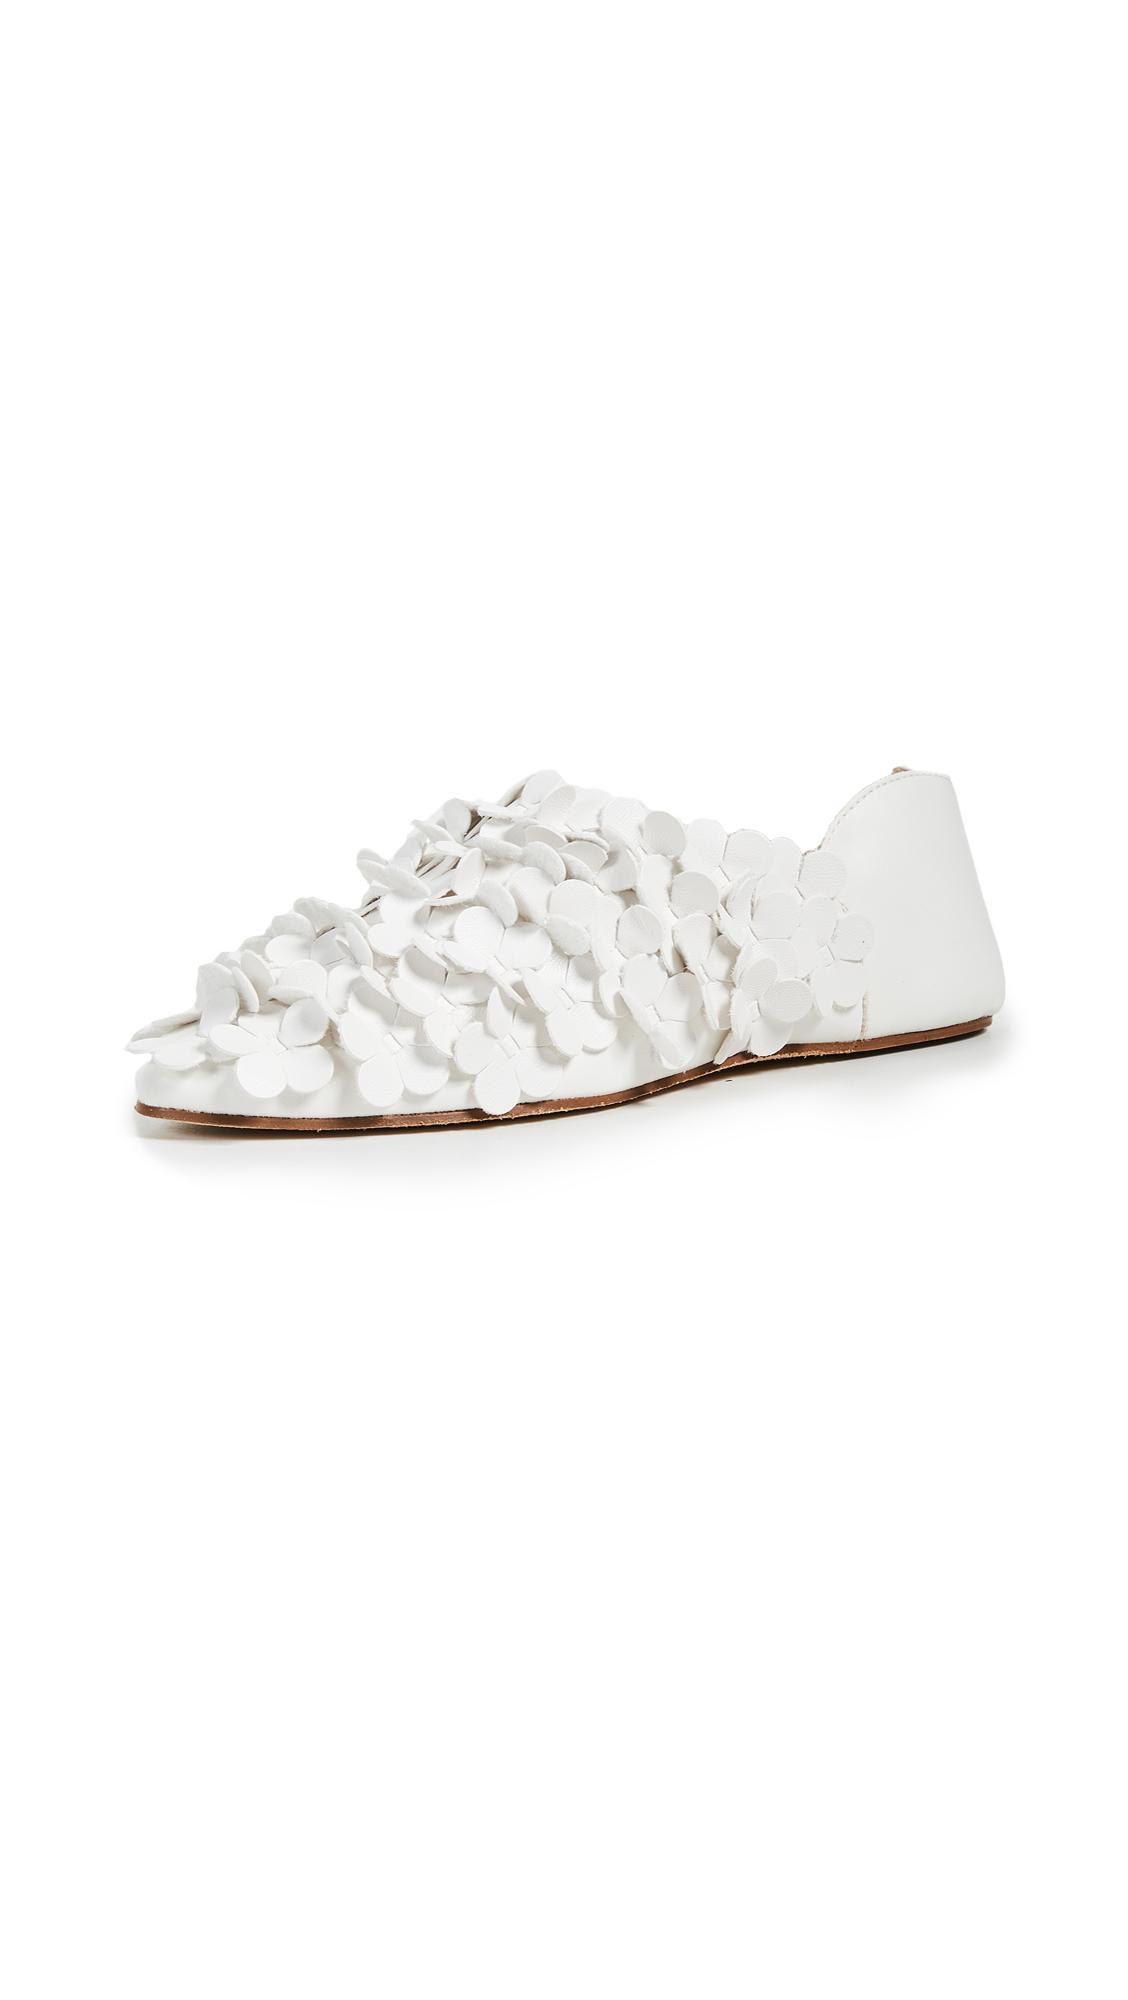 Greymer Faux Leather Medina Mules - Soft Ivory